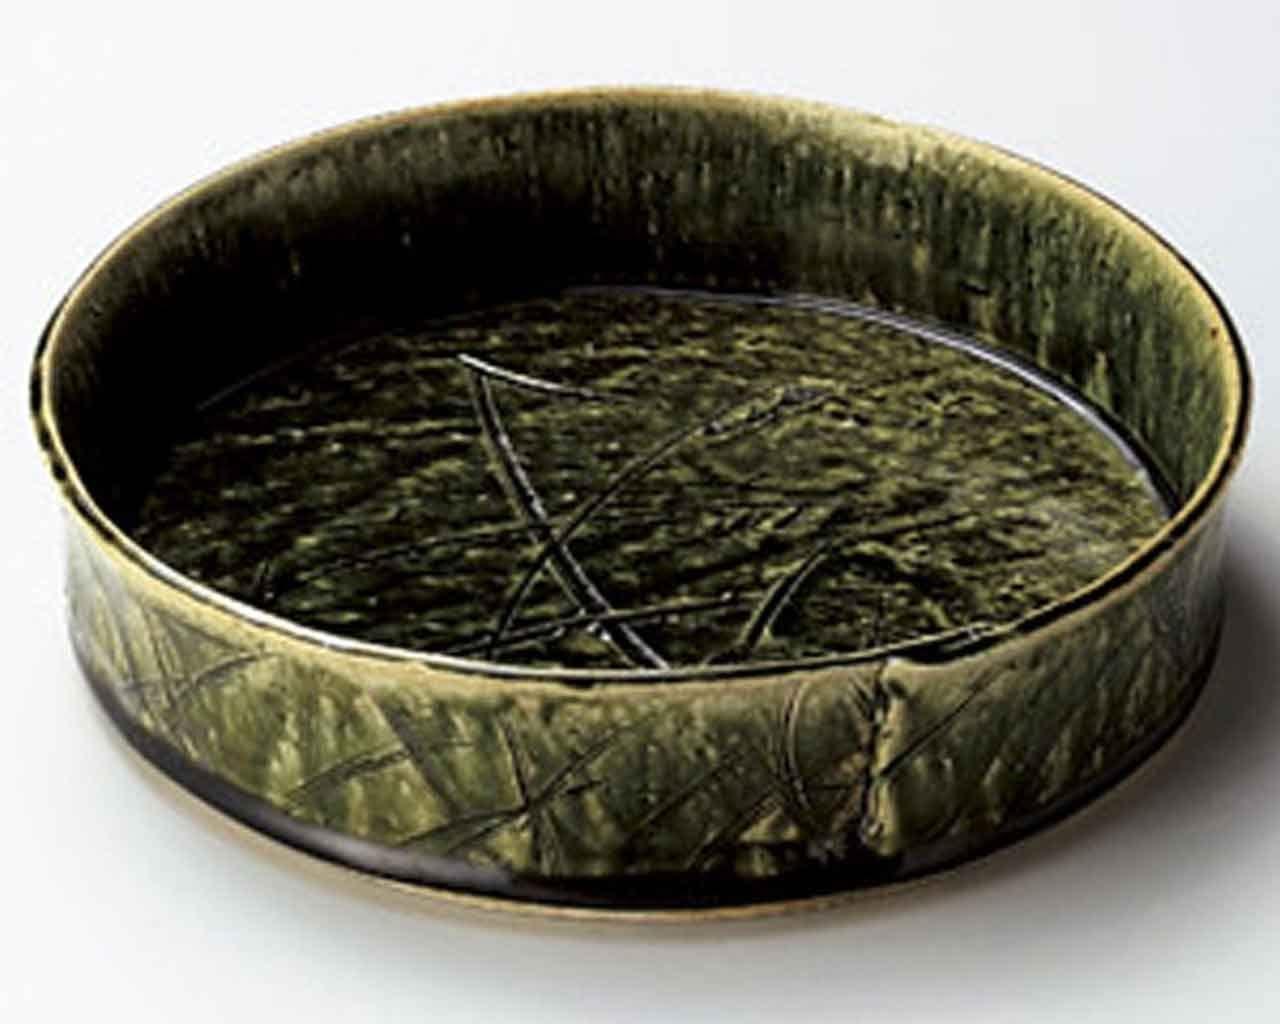 Oribe 9.3inch Large Bowl Green Ceramic Made in Japan